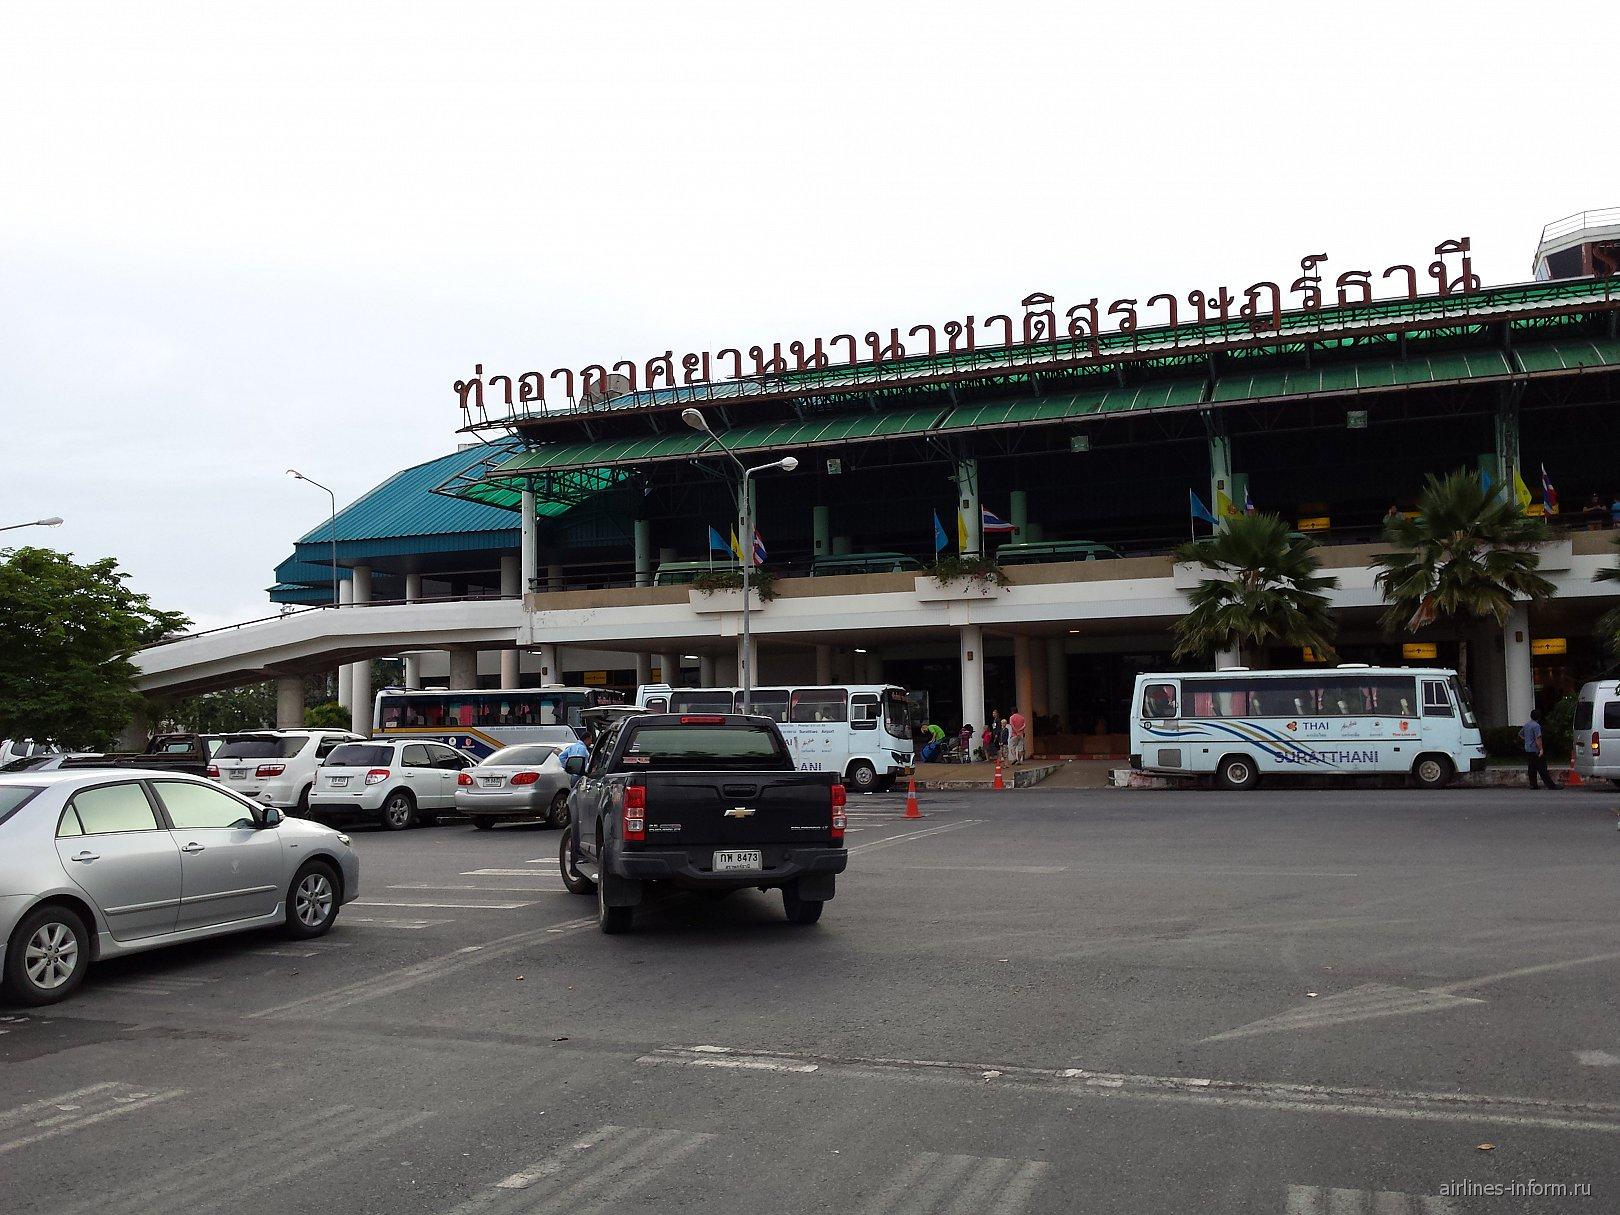 Аэровокзал аэропорта Сураттани на юге Таиланда